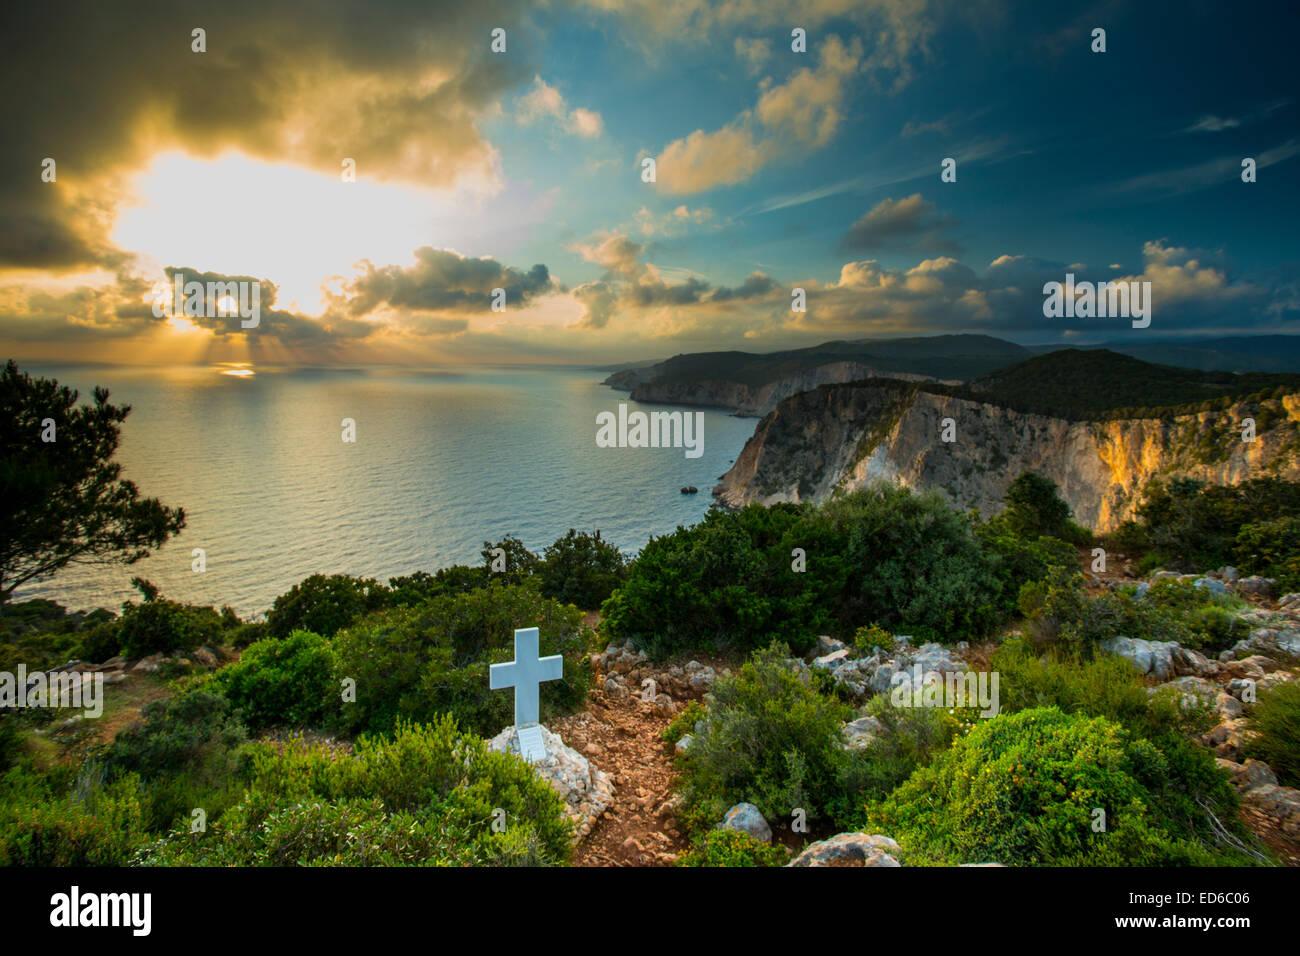 Zakynthos coast, Greece - Stock Image